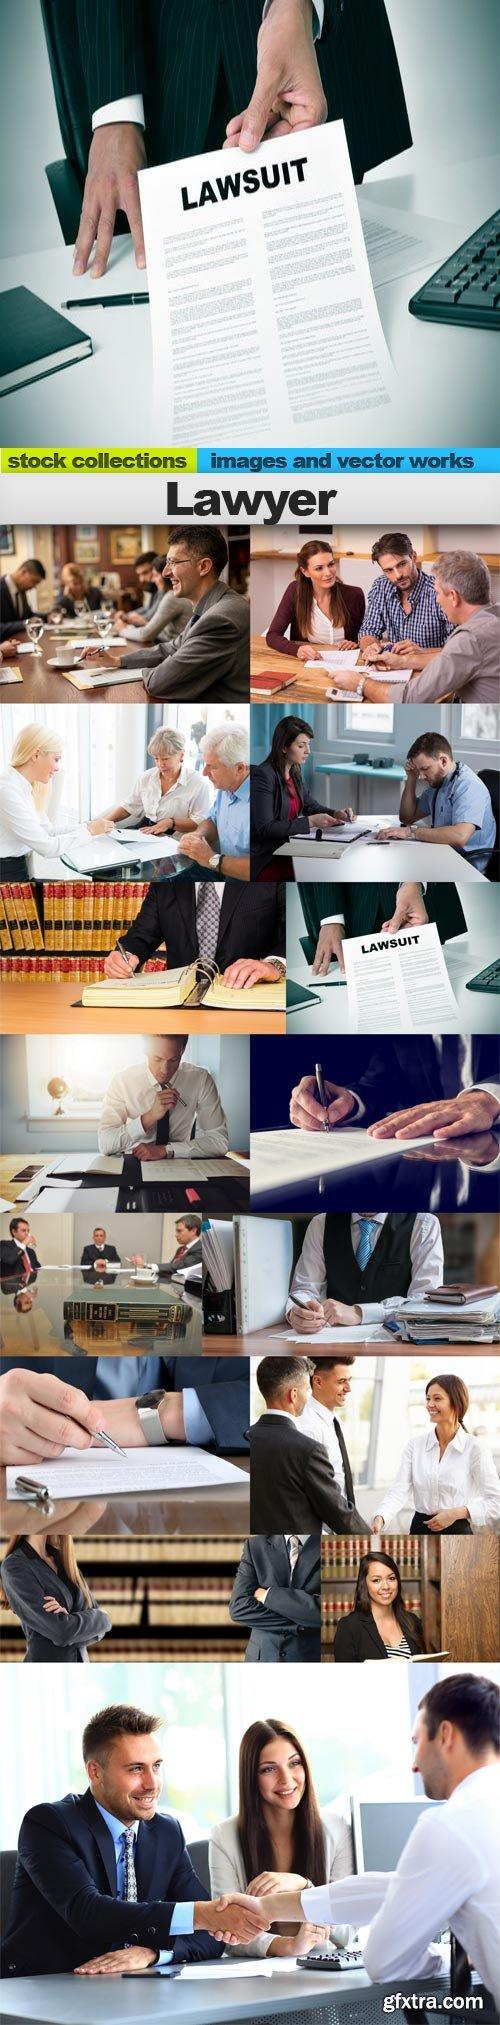 Lawyer, 15 x UHQ JPEG